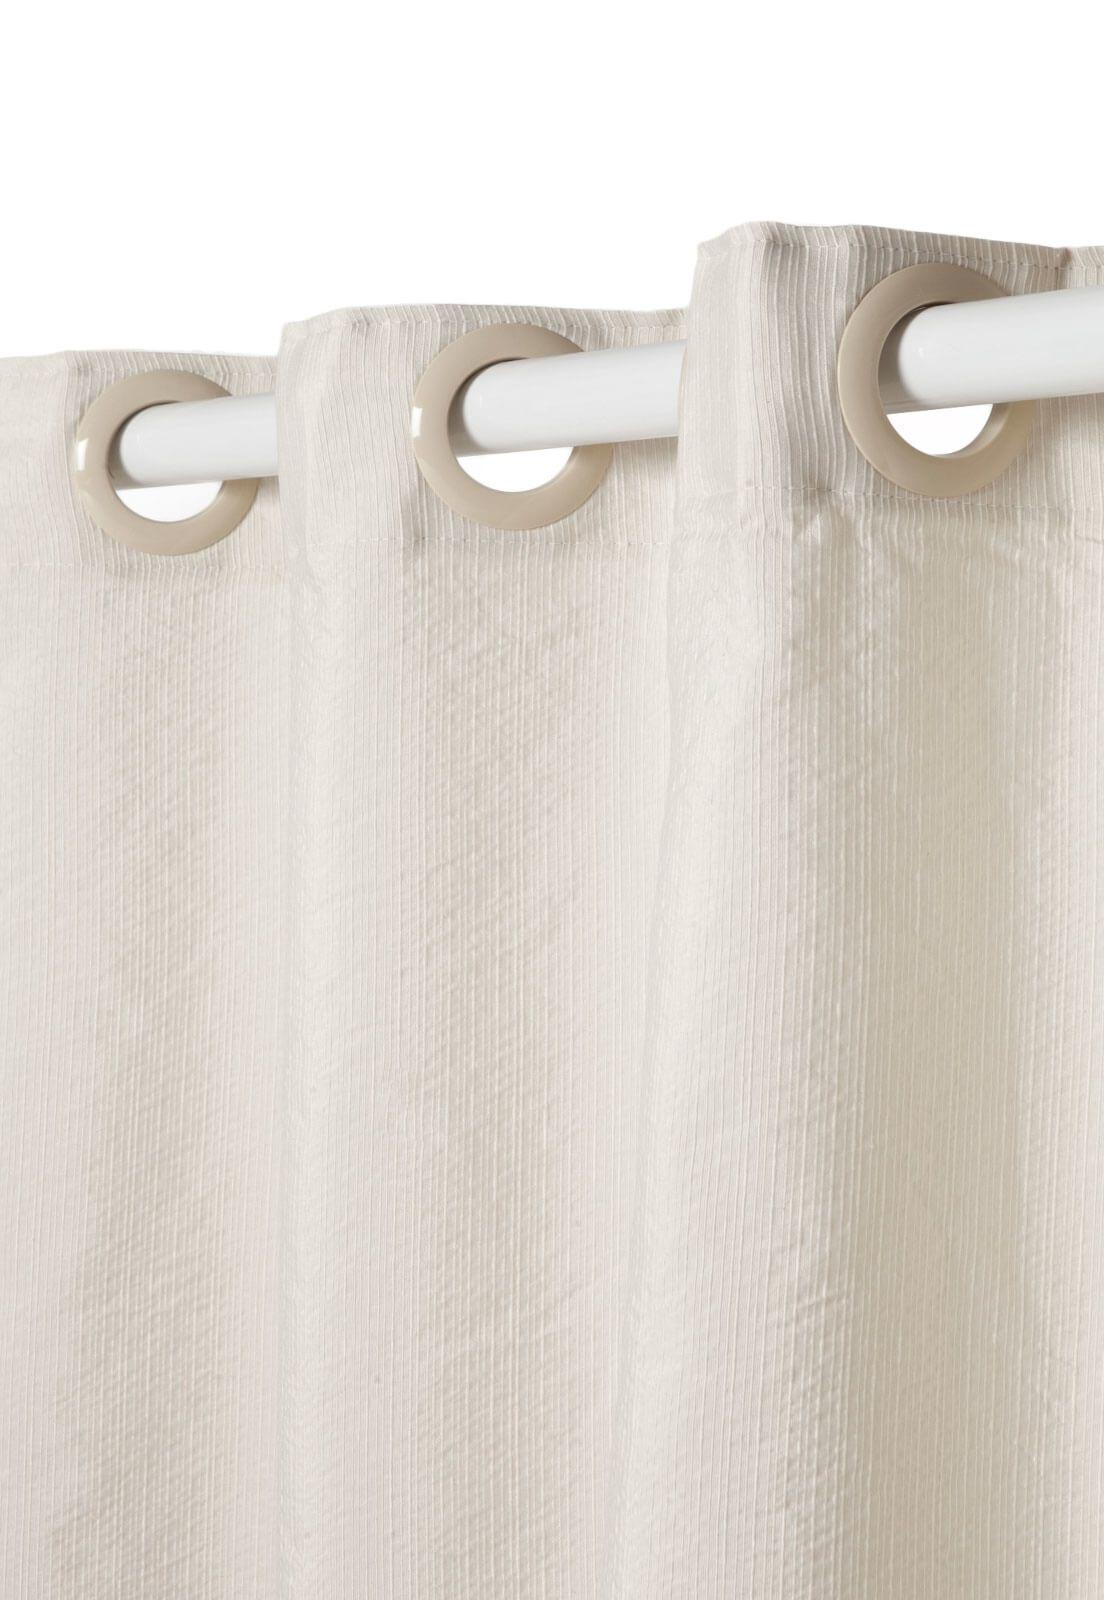 Cortina Rústica New Pantex Marfim 3,60 x 2,30 Bella Janela